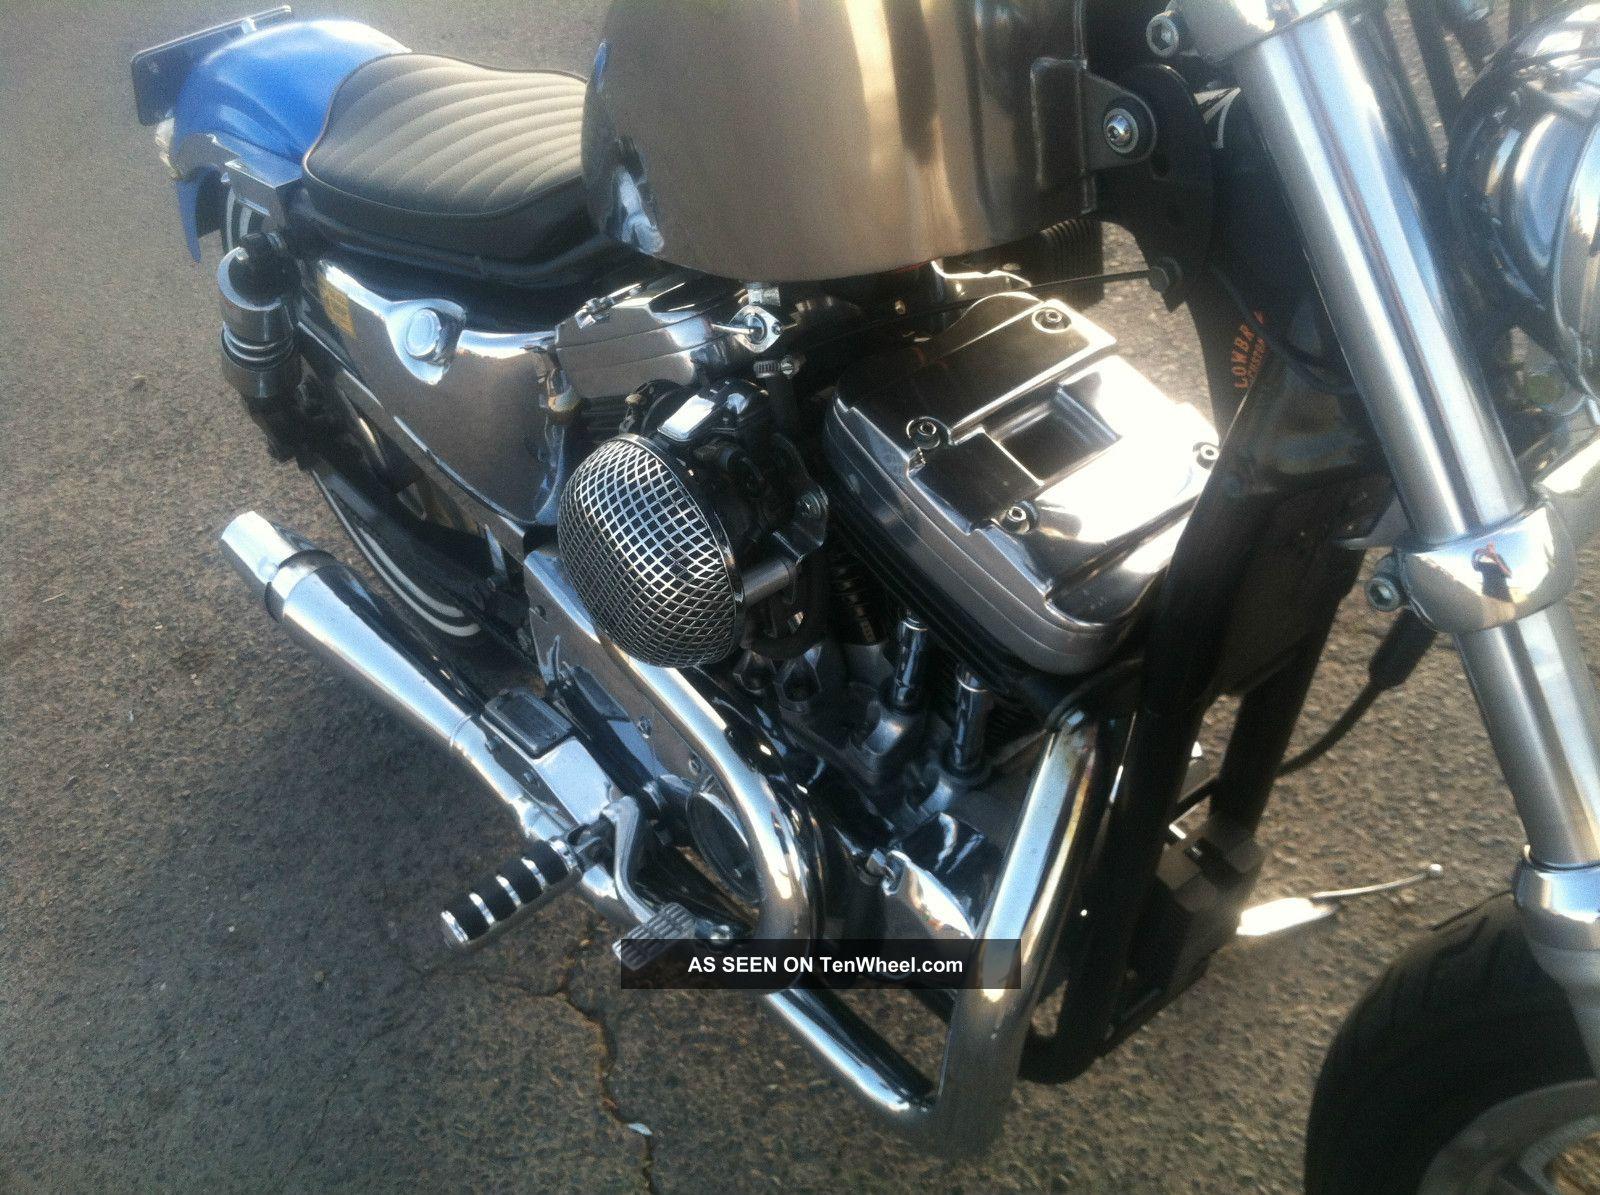 1986 Harley Davidson Full Custom Sportster Very Fast Narrow Near